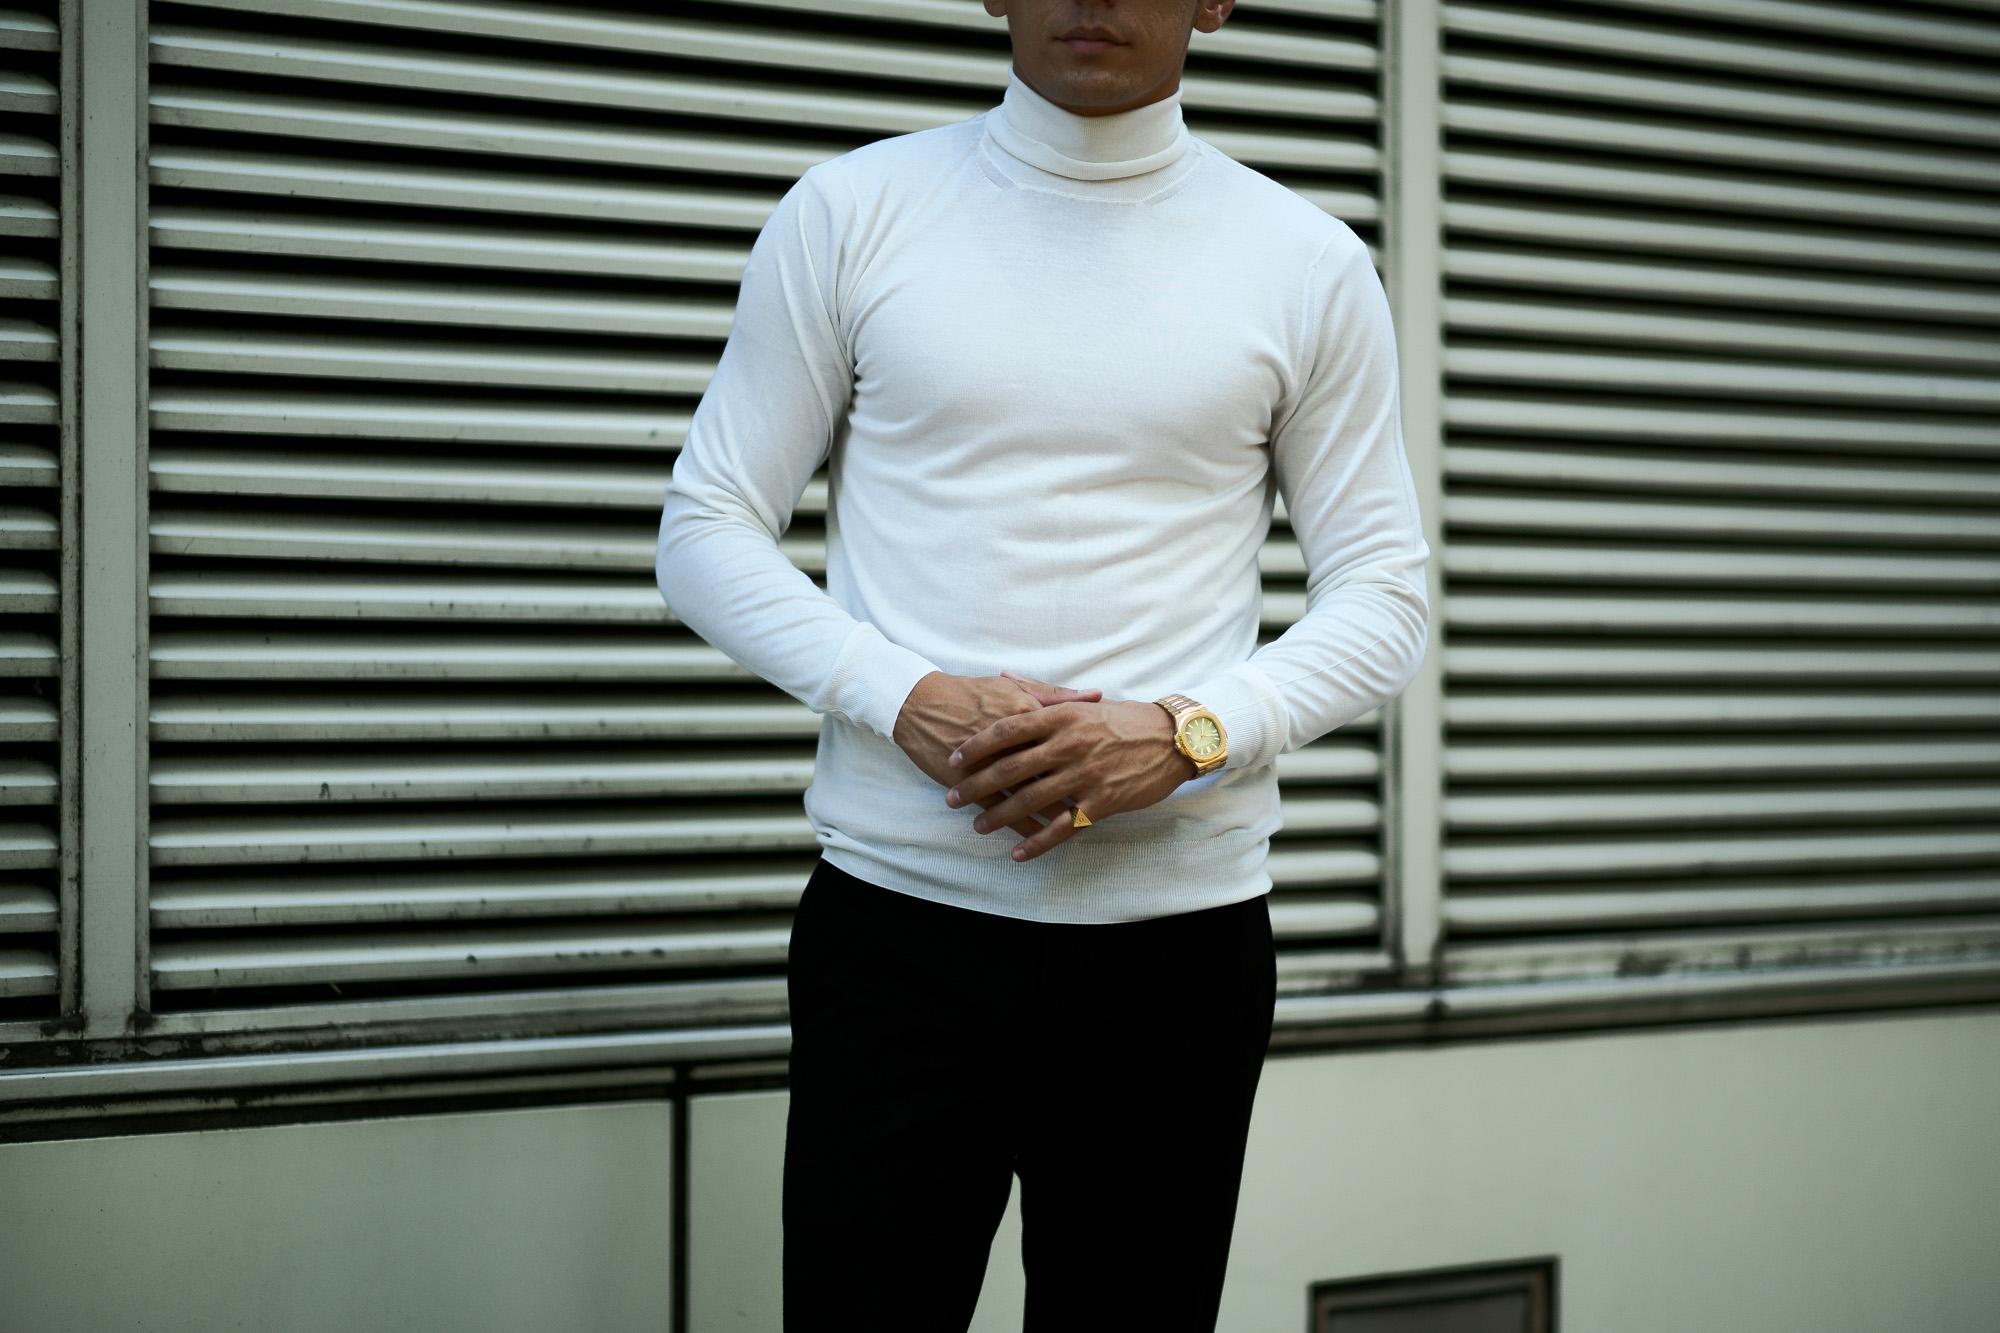 FEDELI (フェデリ) Silk Cashmere Turtle Neck Sweater シルクカシミア タートルネック セーター WHITE (ホワイト・22) made in italy (イタリア製) 2021 秋冬新作 愛知 名古屋 Alto e Diritto altoediritto アルトエデリット シルカシニット